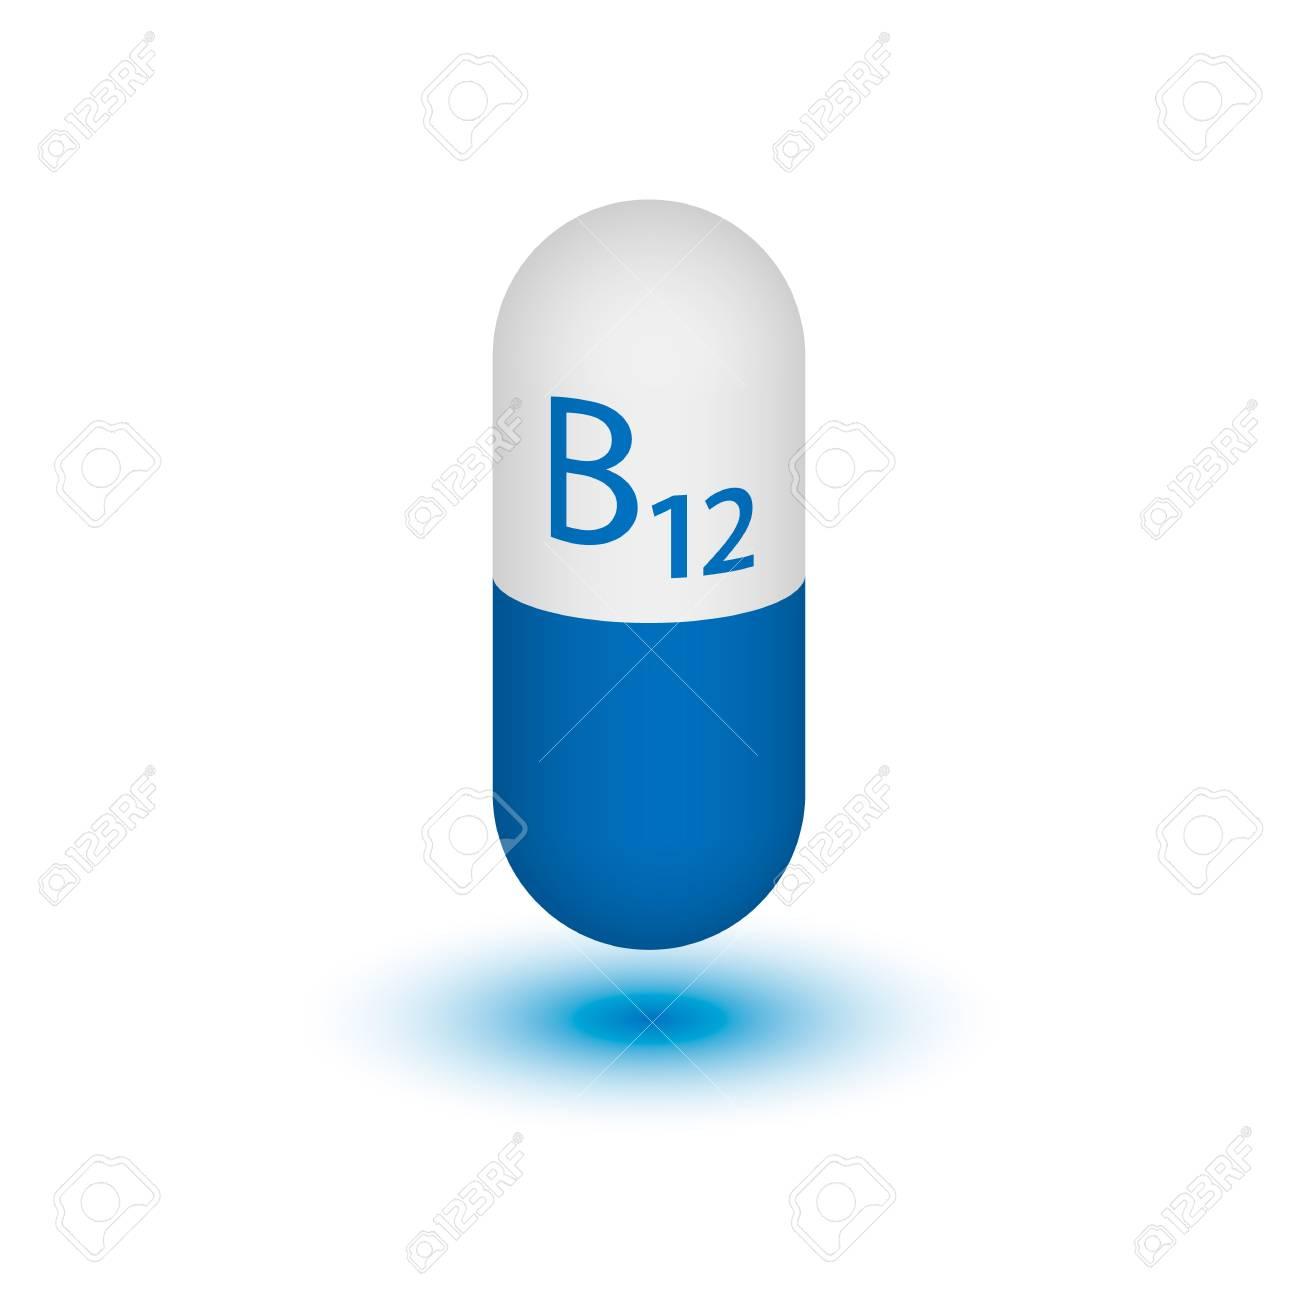 Vitamin B12 shot  Cyanocobalamin  Two-tone capsule on a white